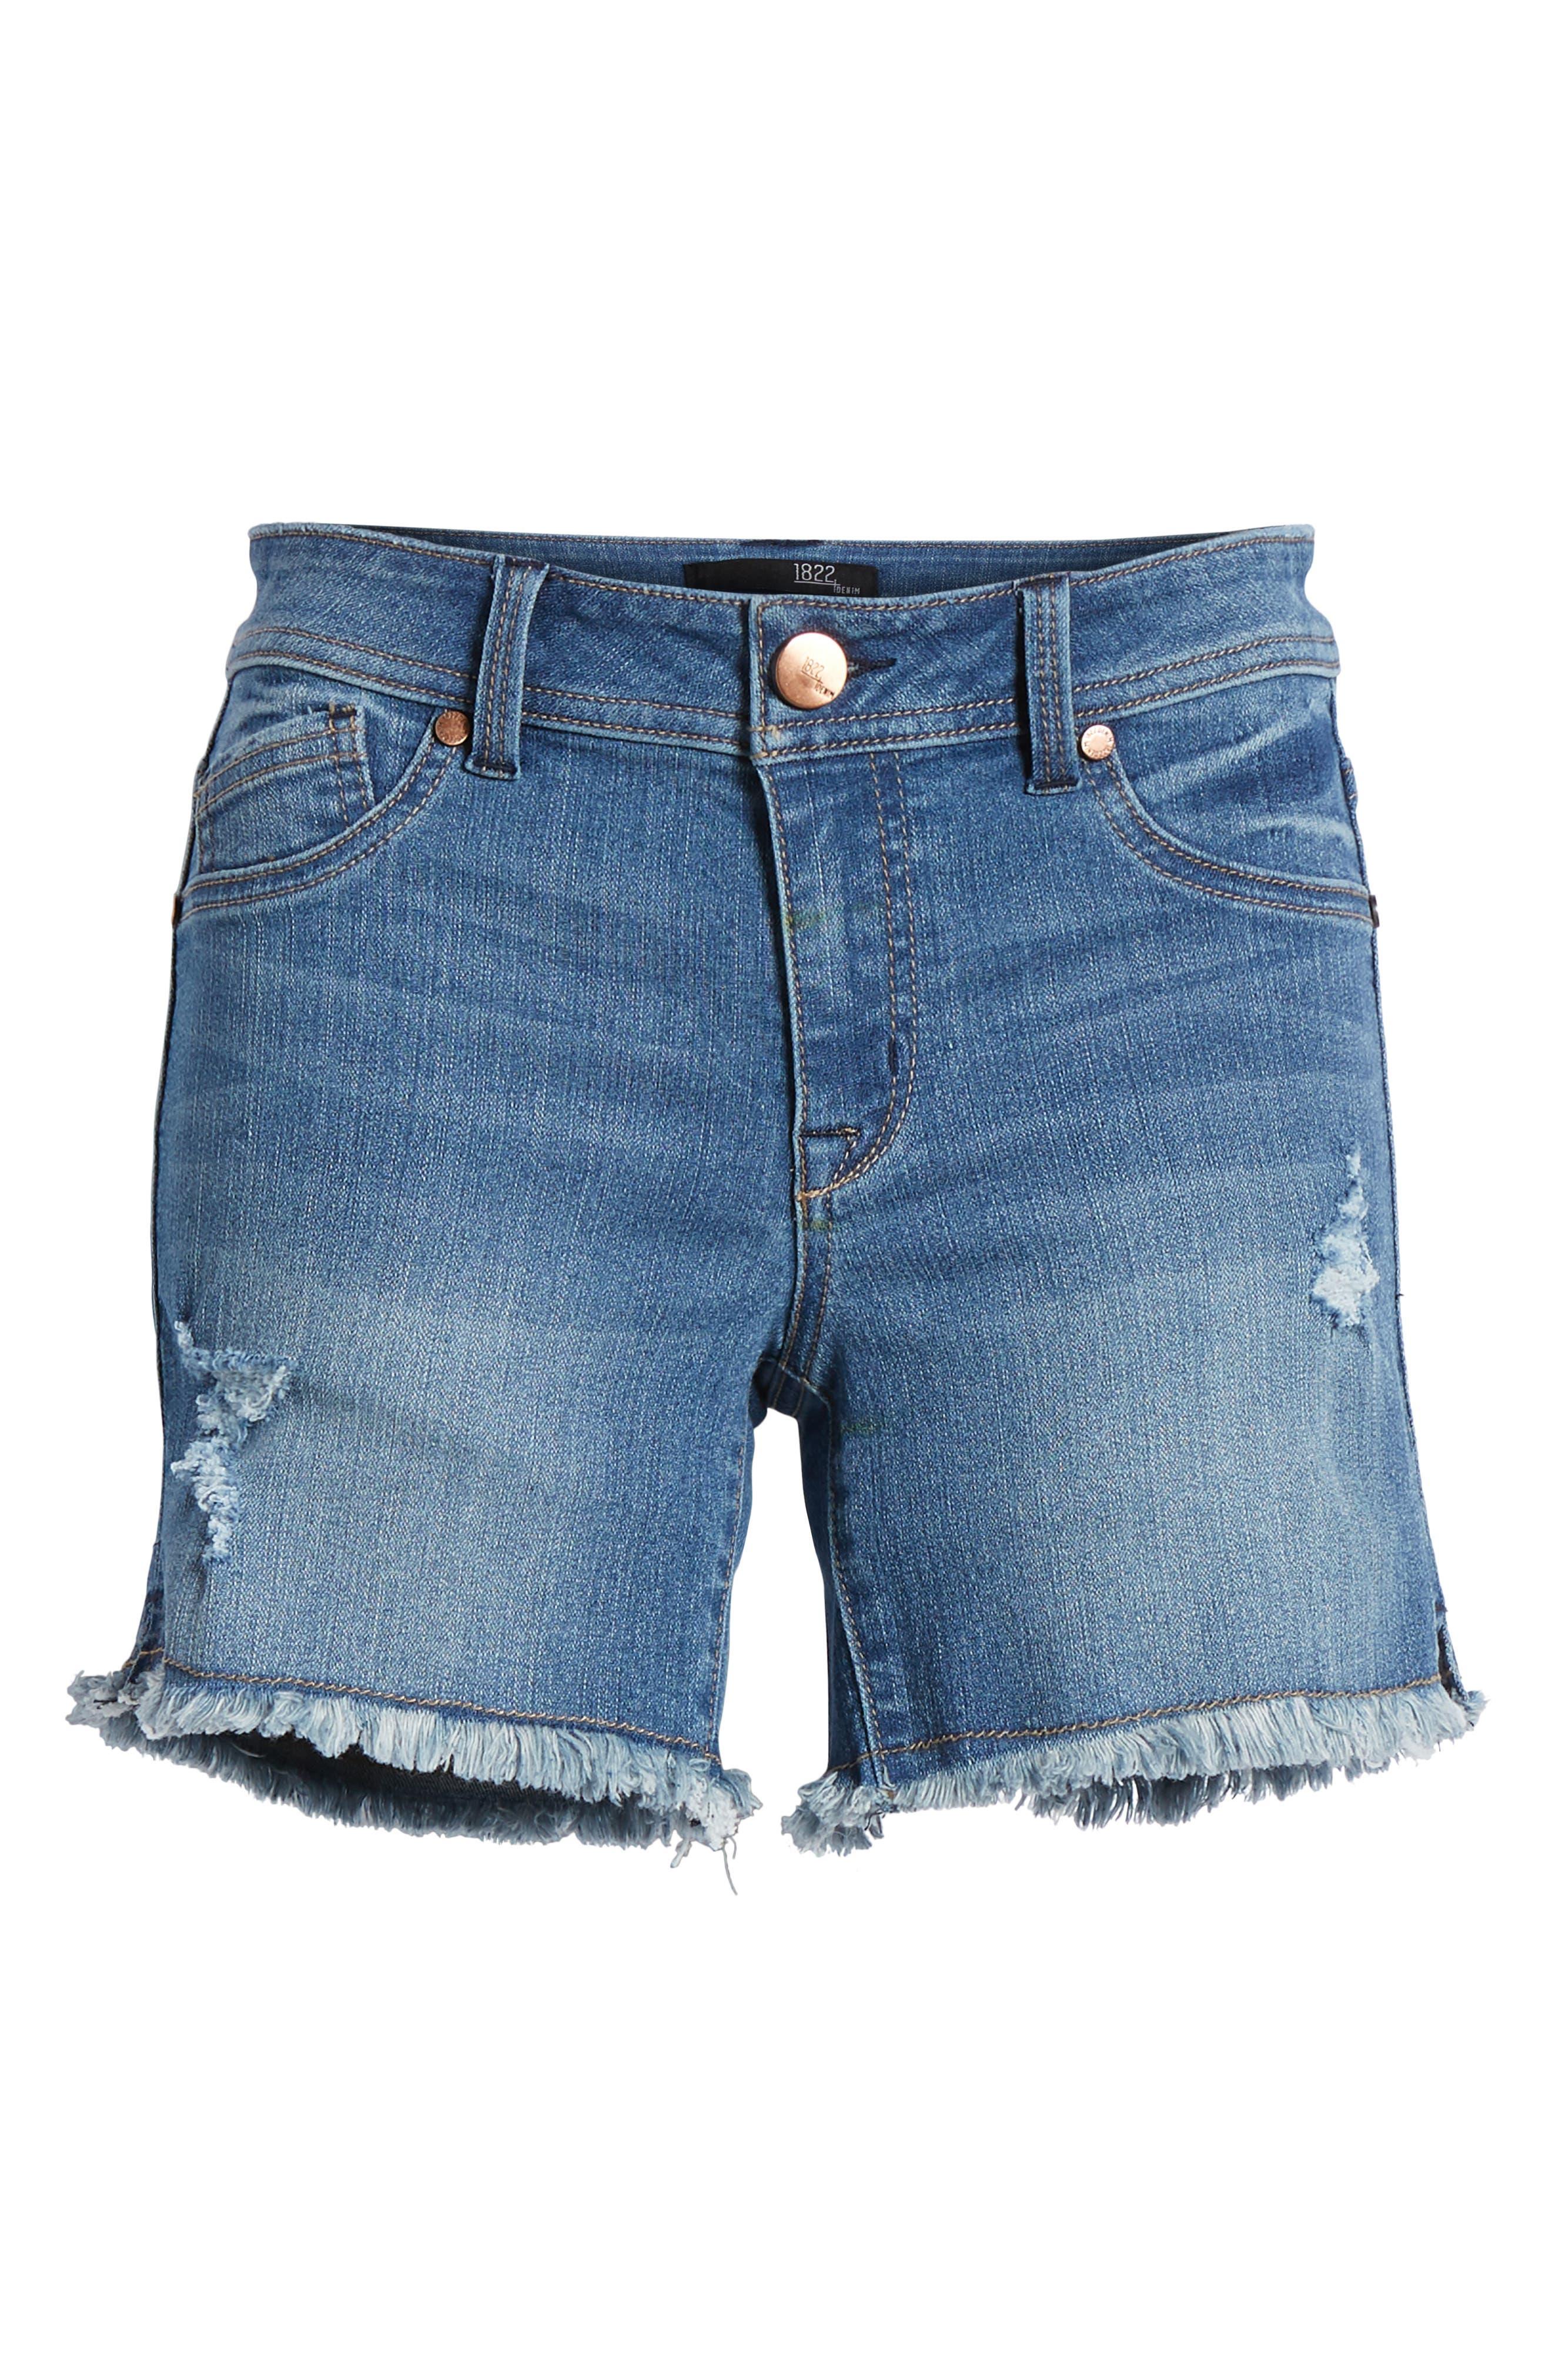 Raw Hem Denim Shorts,                             Alternate thumbnail 7, color,                             Narissa